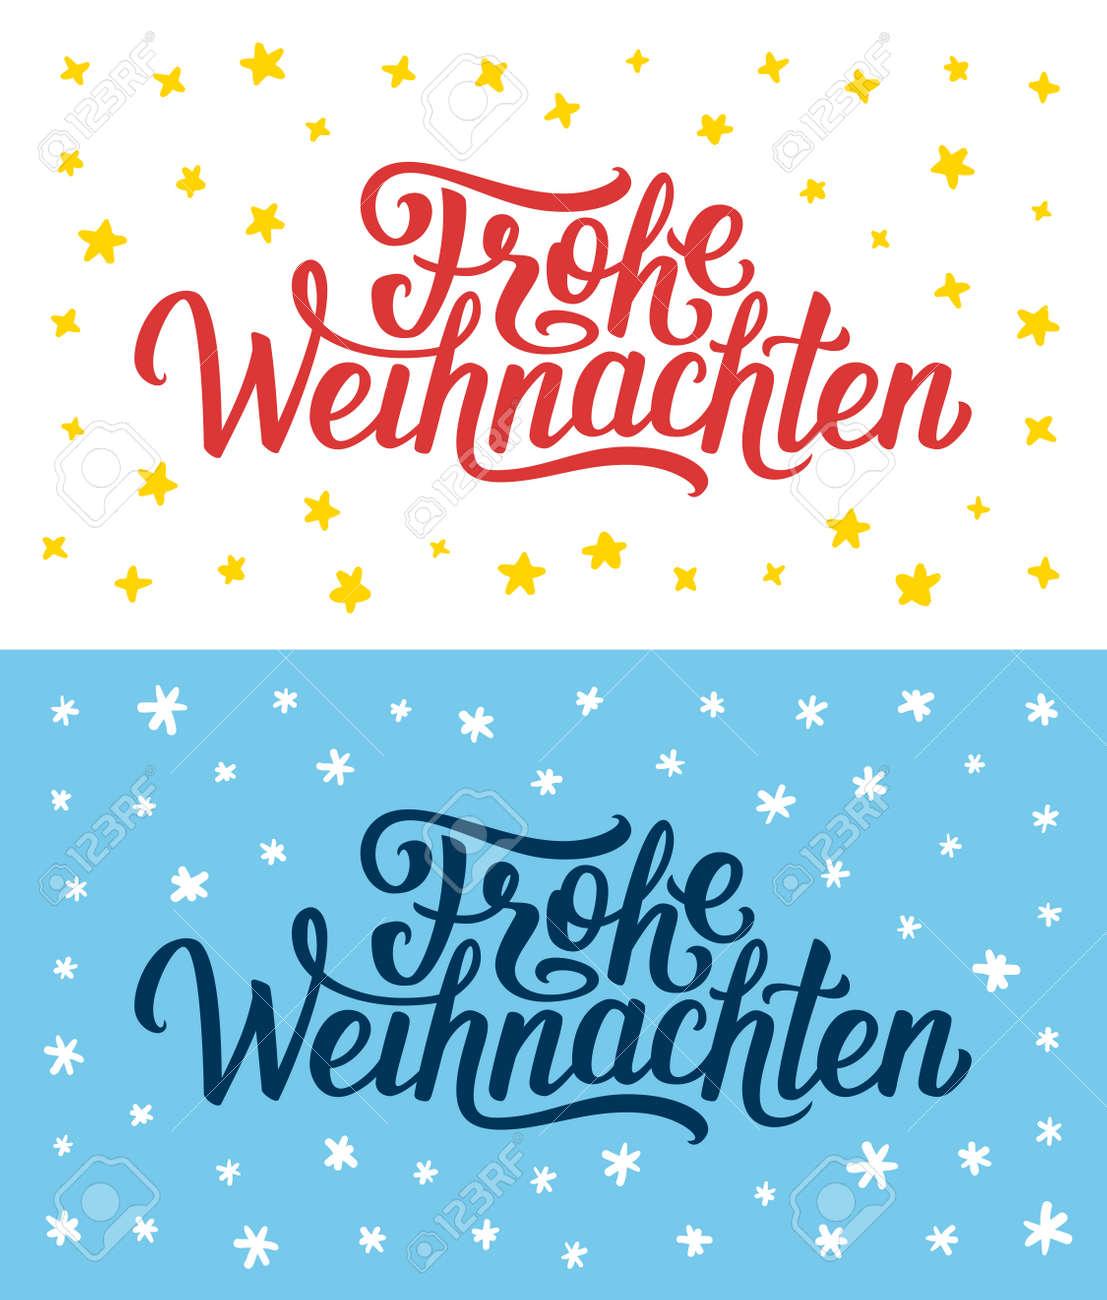 Weihnachtsgrüße Text.Stock Photo